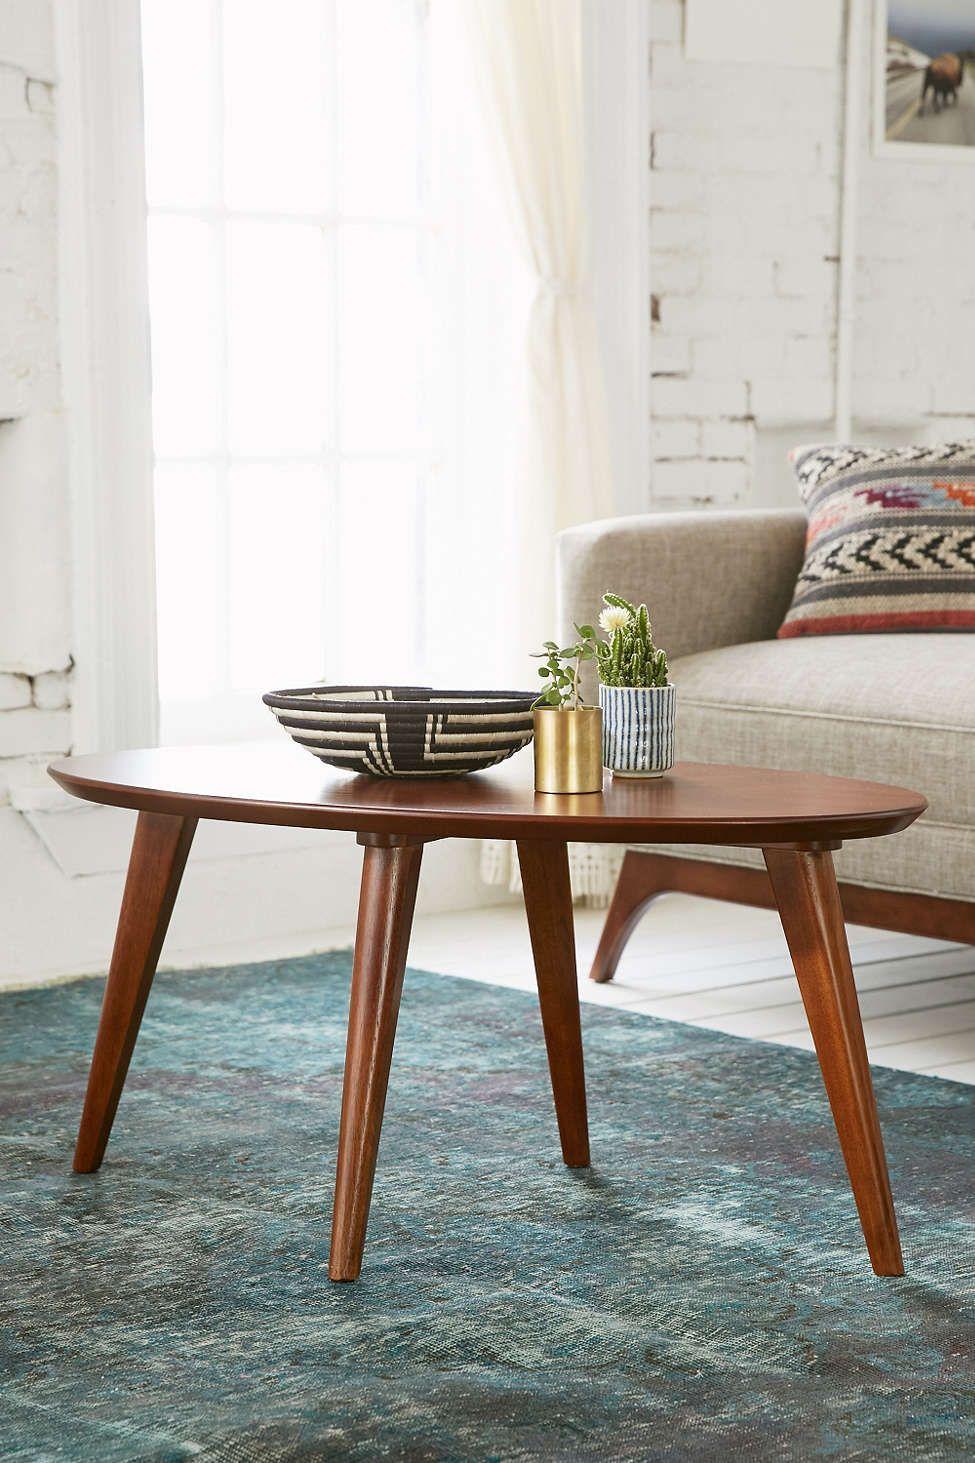 tovah coffee table uohome coffee table urban. Black Bedroom Furniture Sets. Home Design Ideas